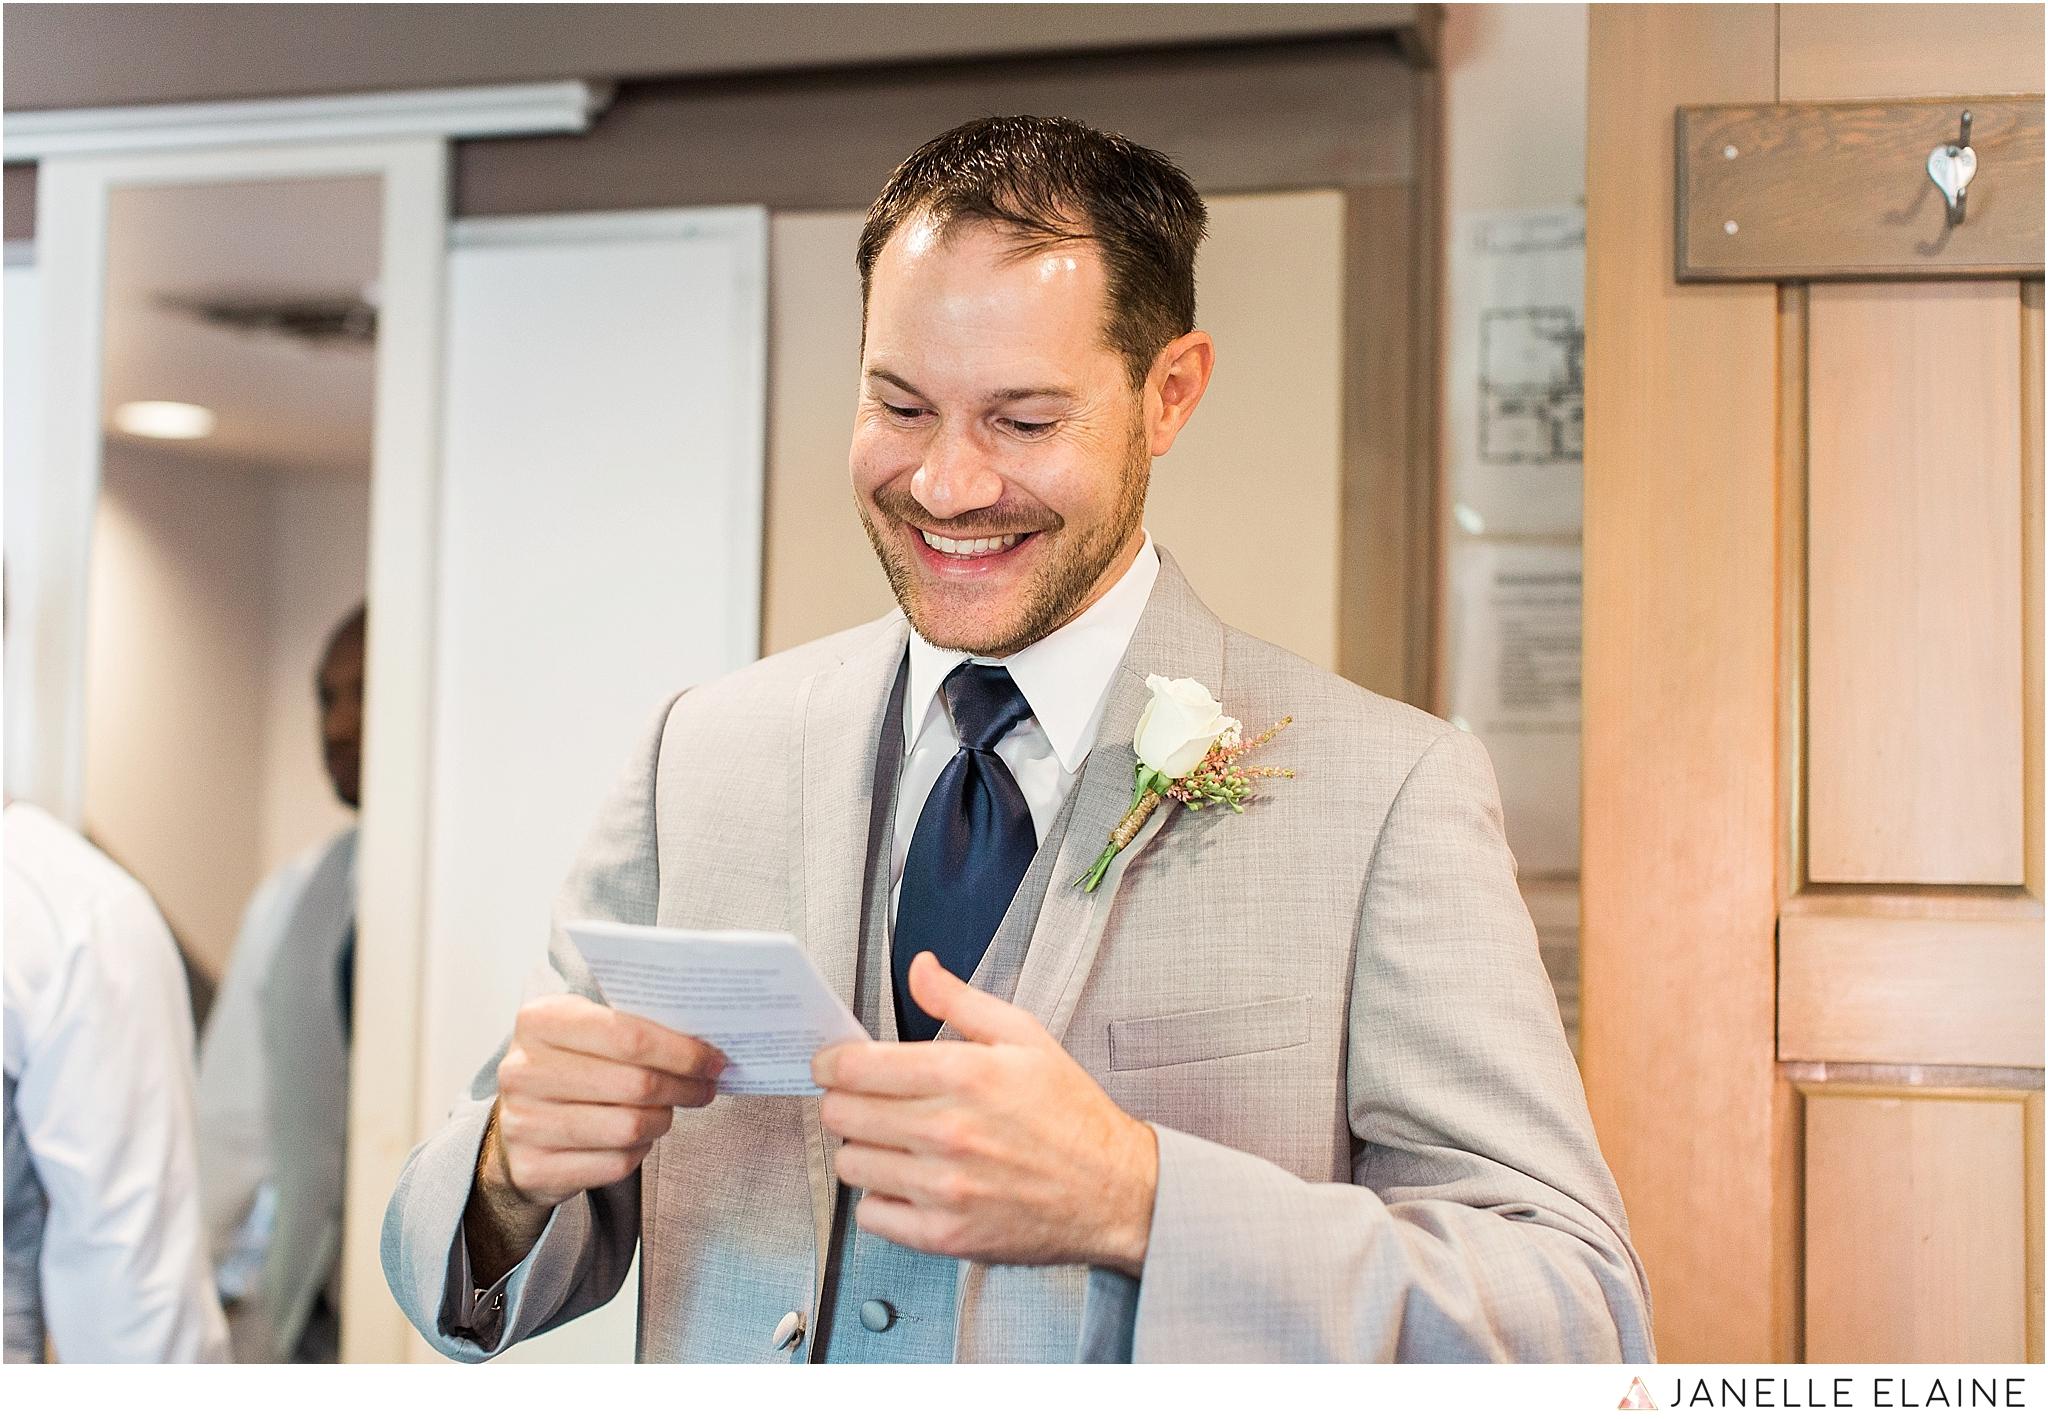 janelle elaine photography-professional wedding photographer-seattle-bellevue-robinswood house-75.jpg